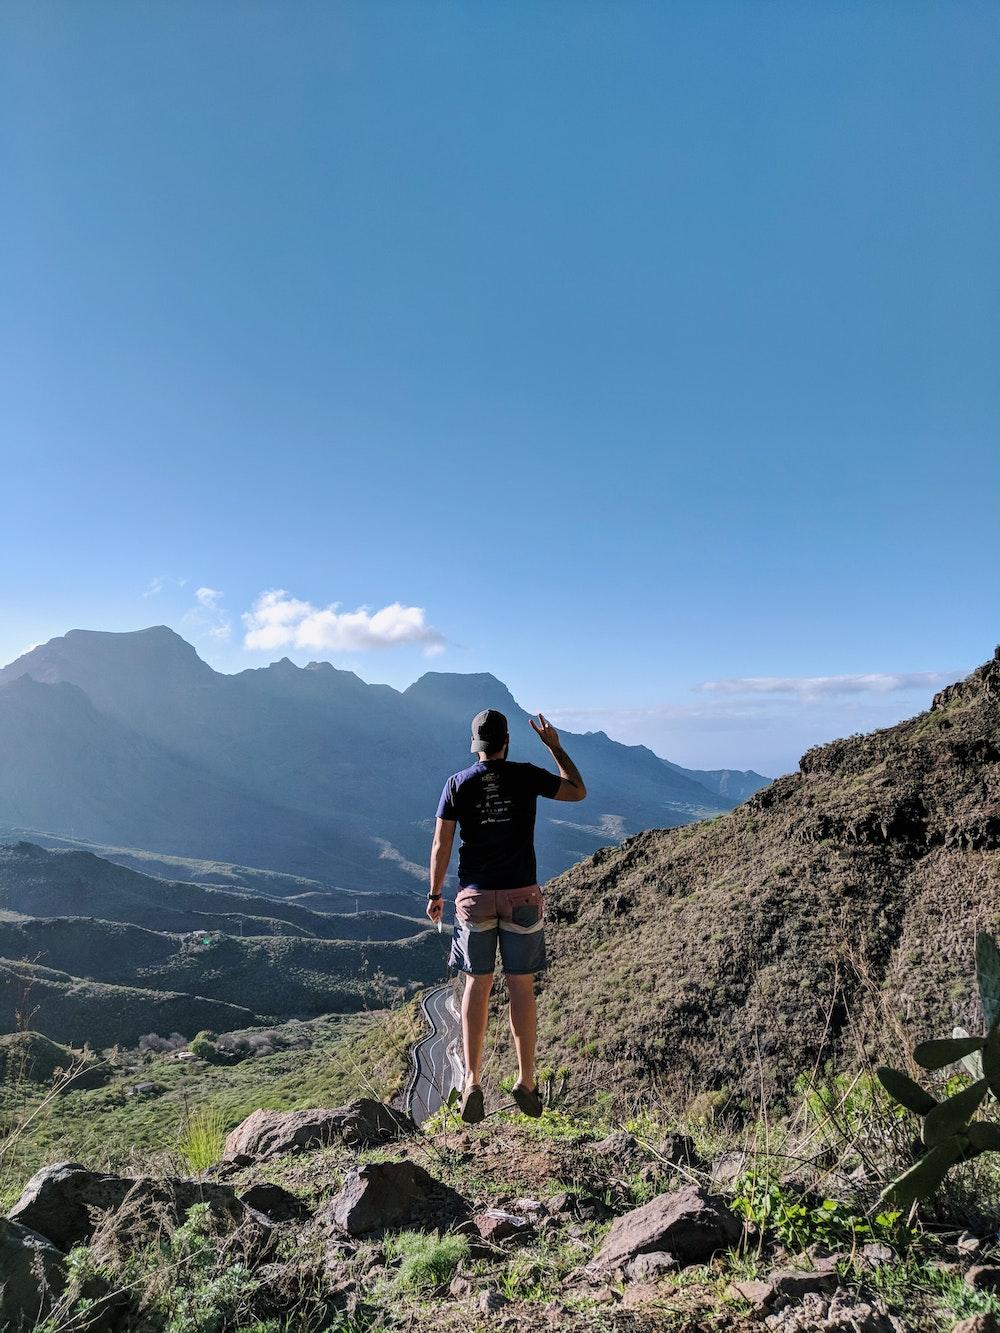 Dan in Gran Canaria